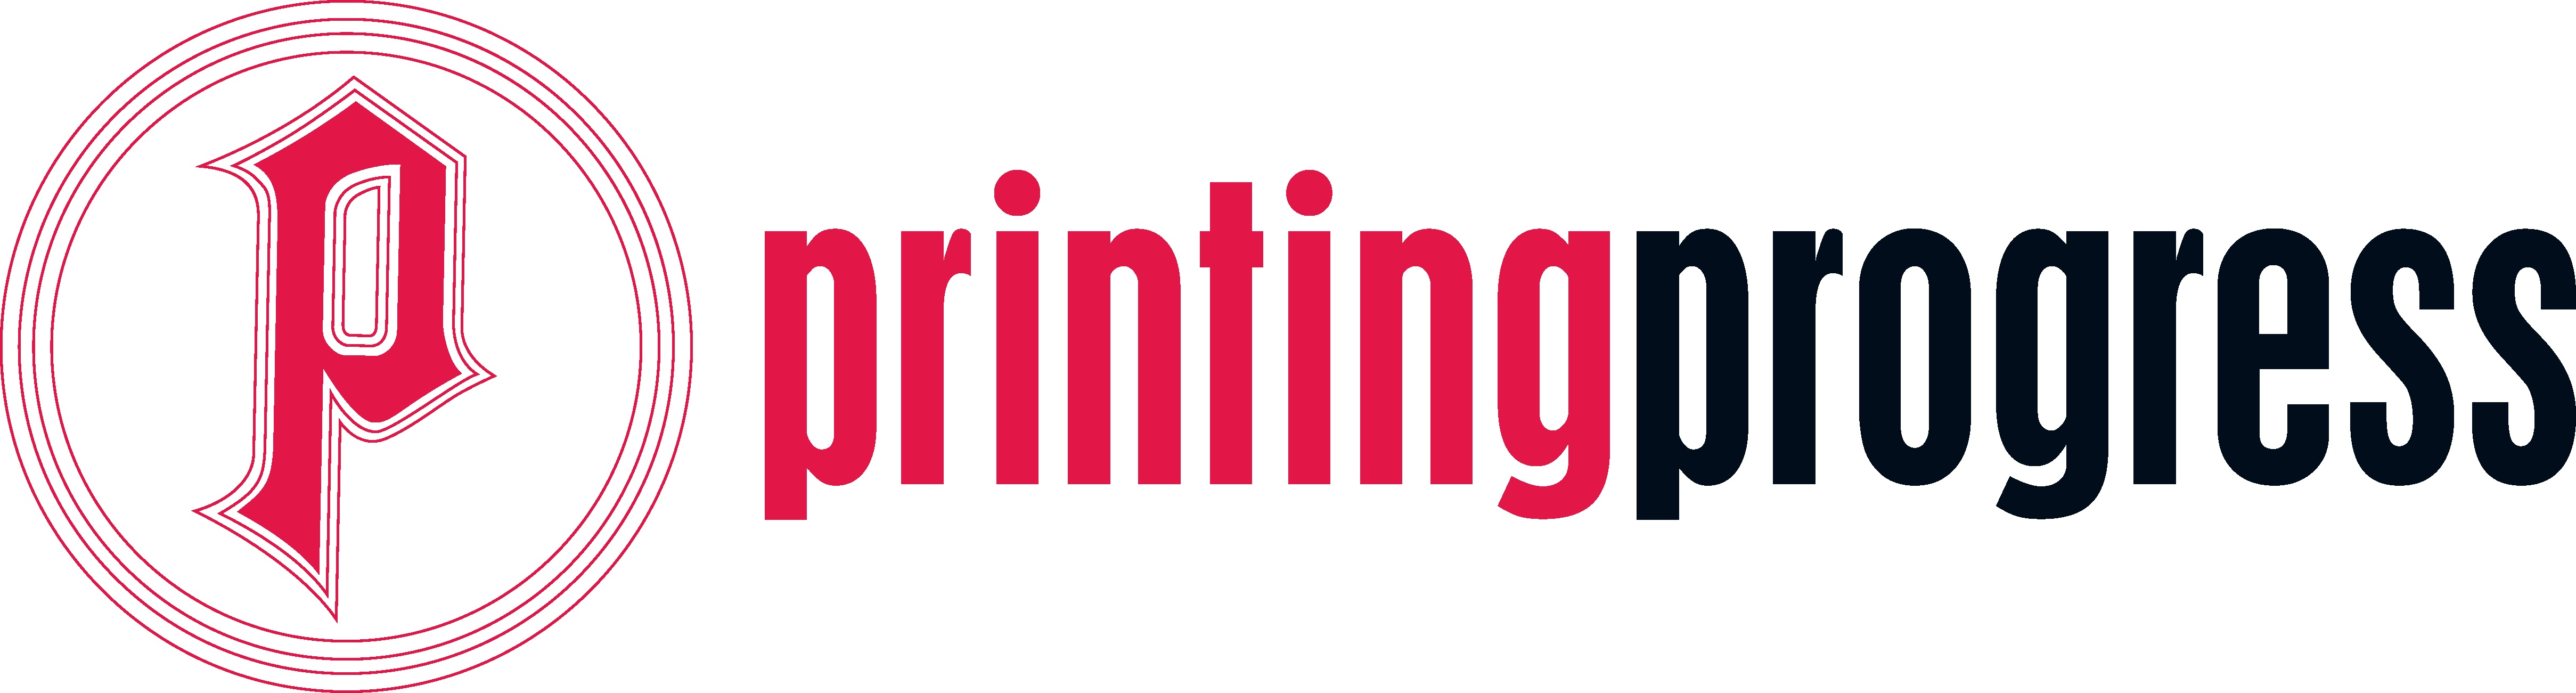 PrintingProgress